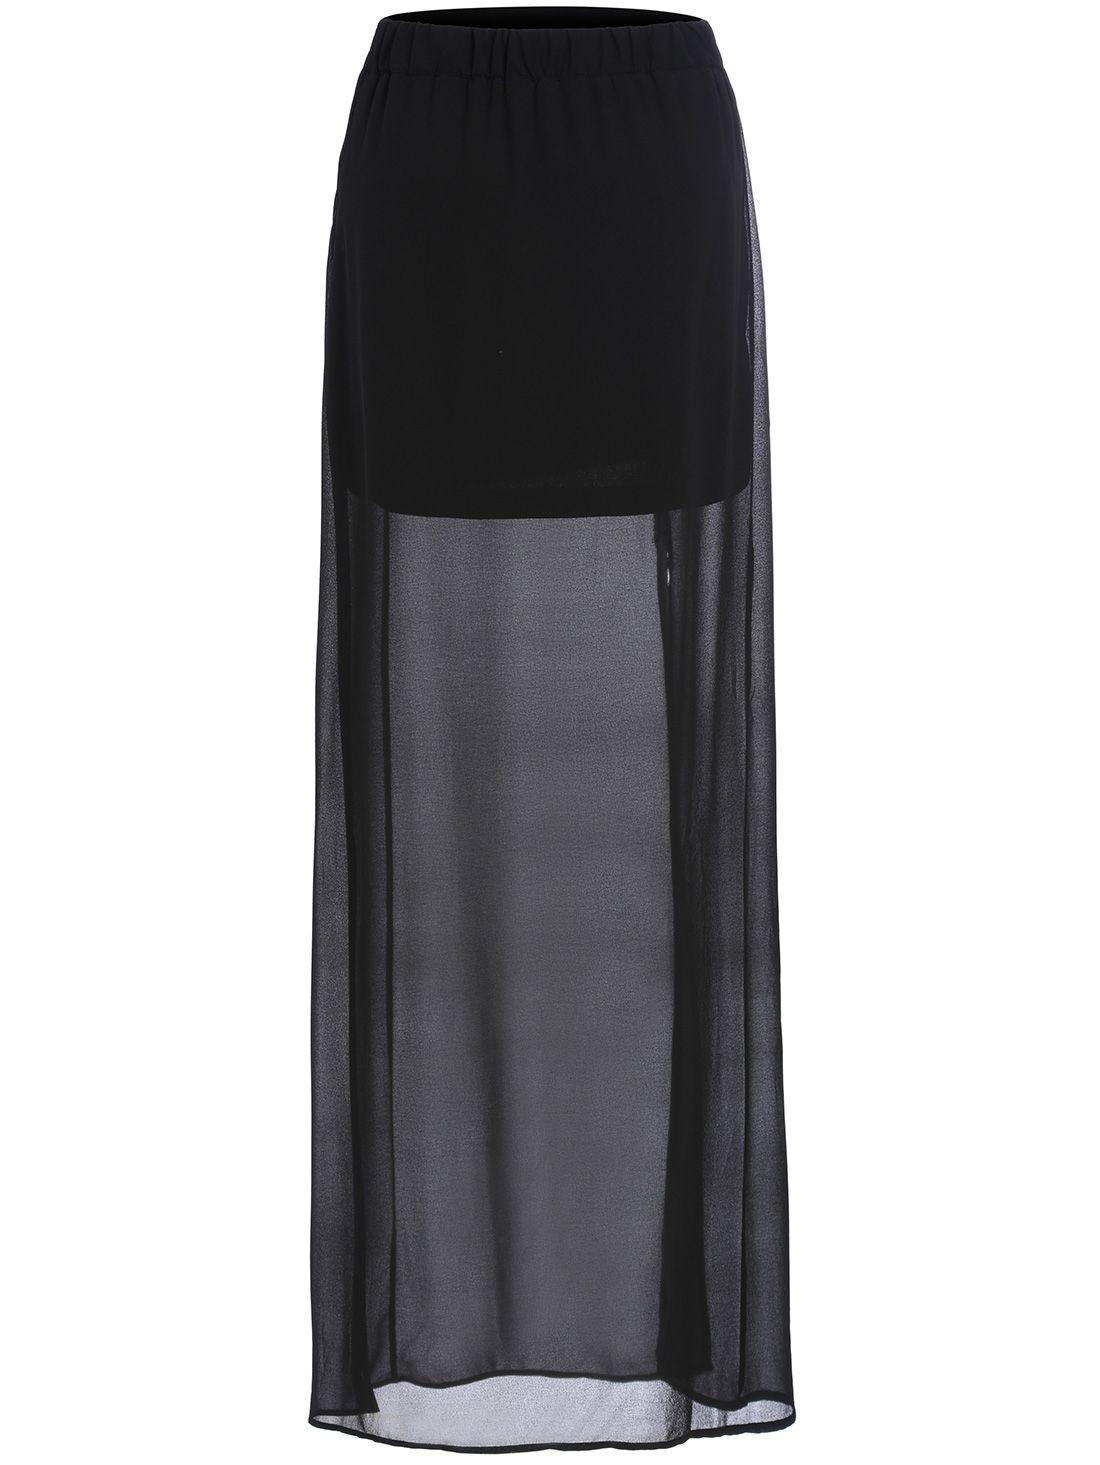 971f59f36f Shop Black Split Sheer Chiffon Skirt online. SheIn offers Black Split Sheer  Chiffon Skirt & more to fit your fashionable needs.